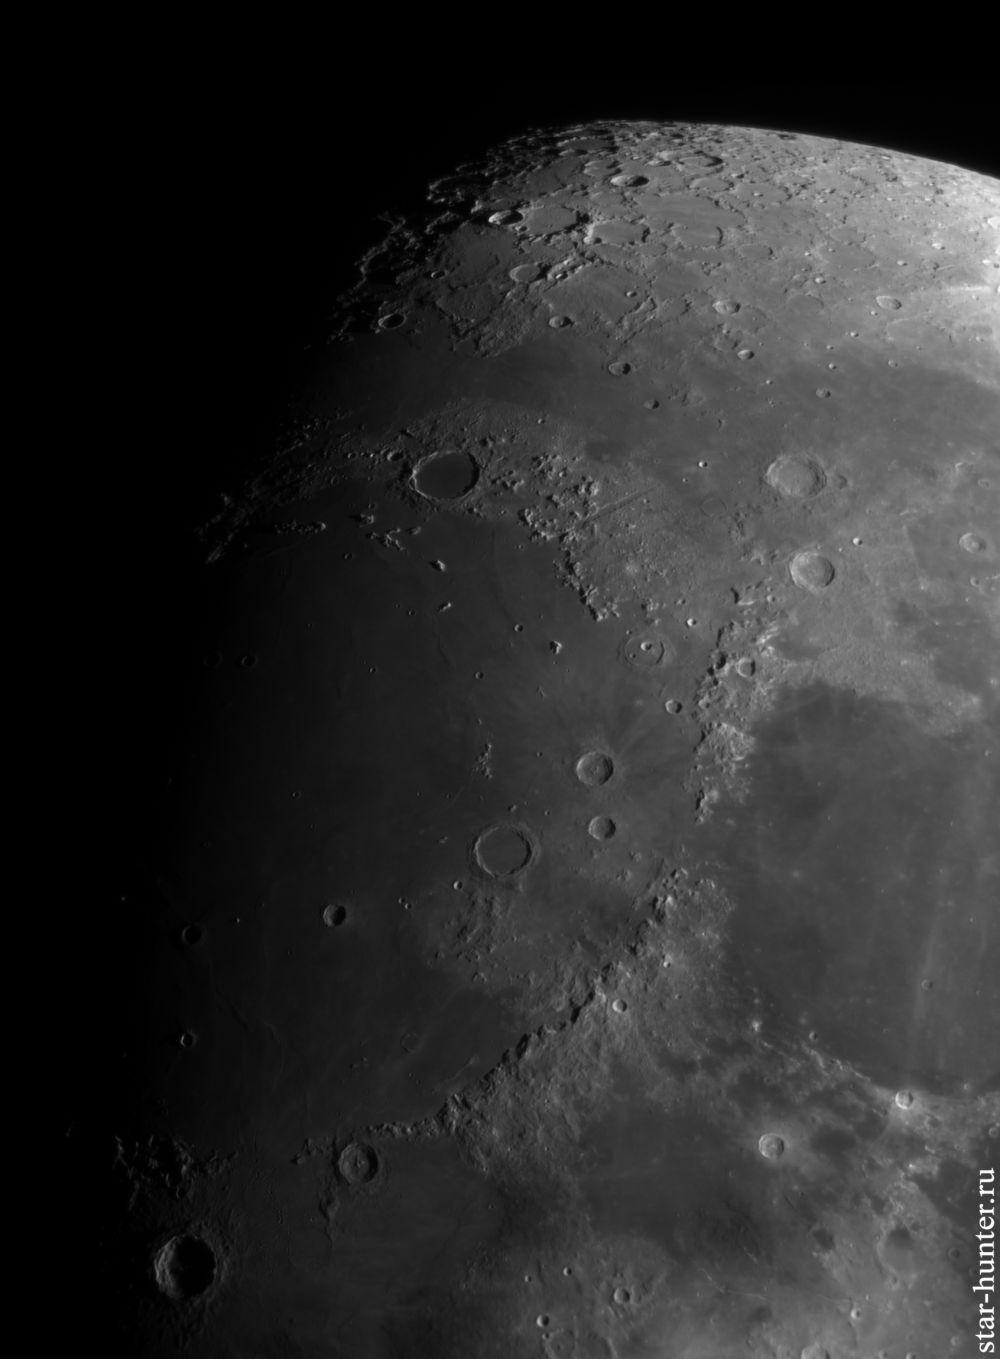 Moon, November 6, 2019, 20:10.